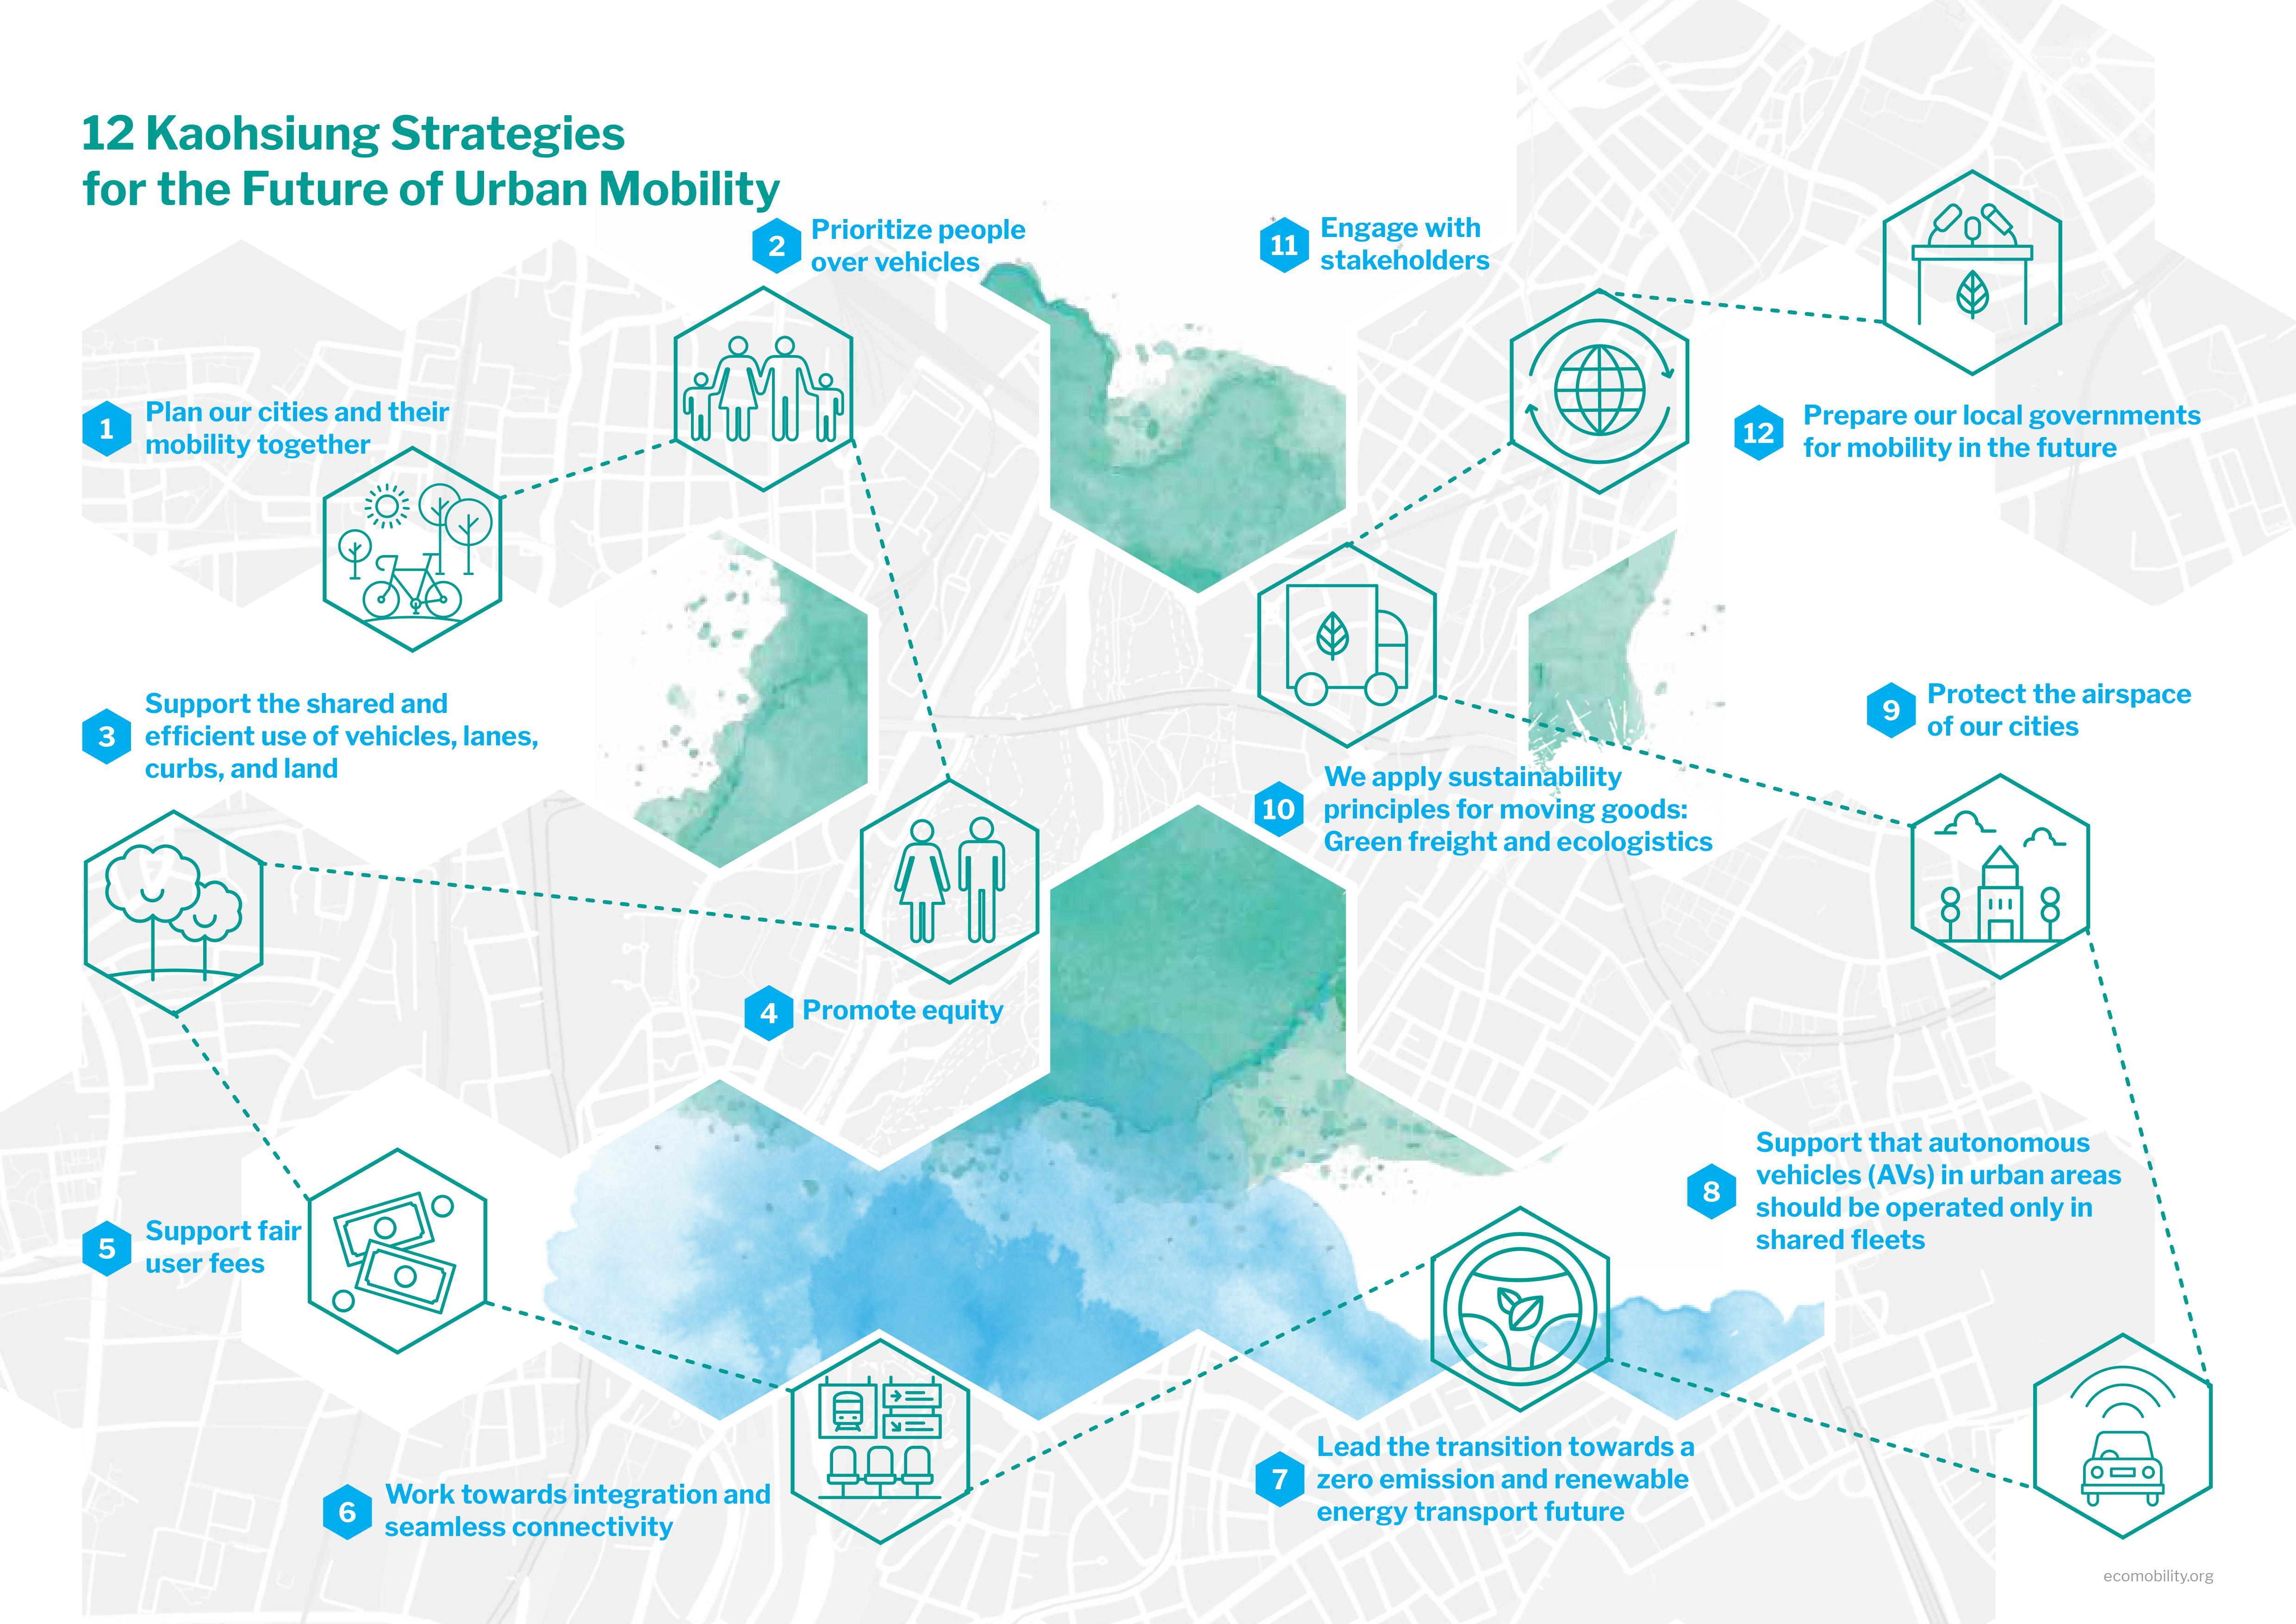 Kaohsiung Strategies – EcoMobility